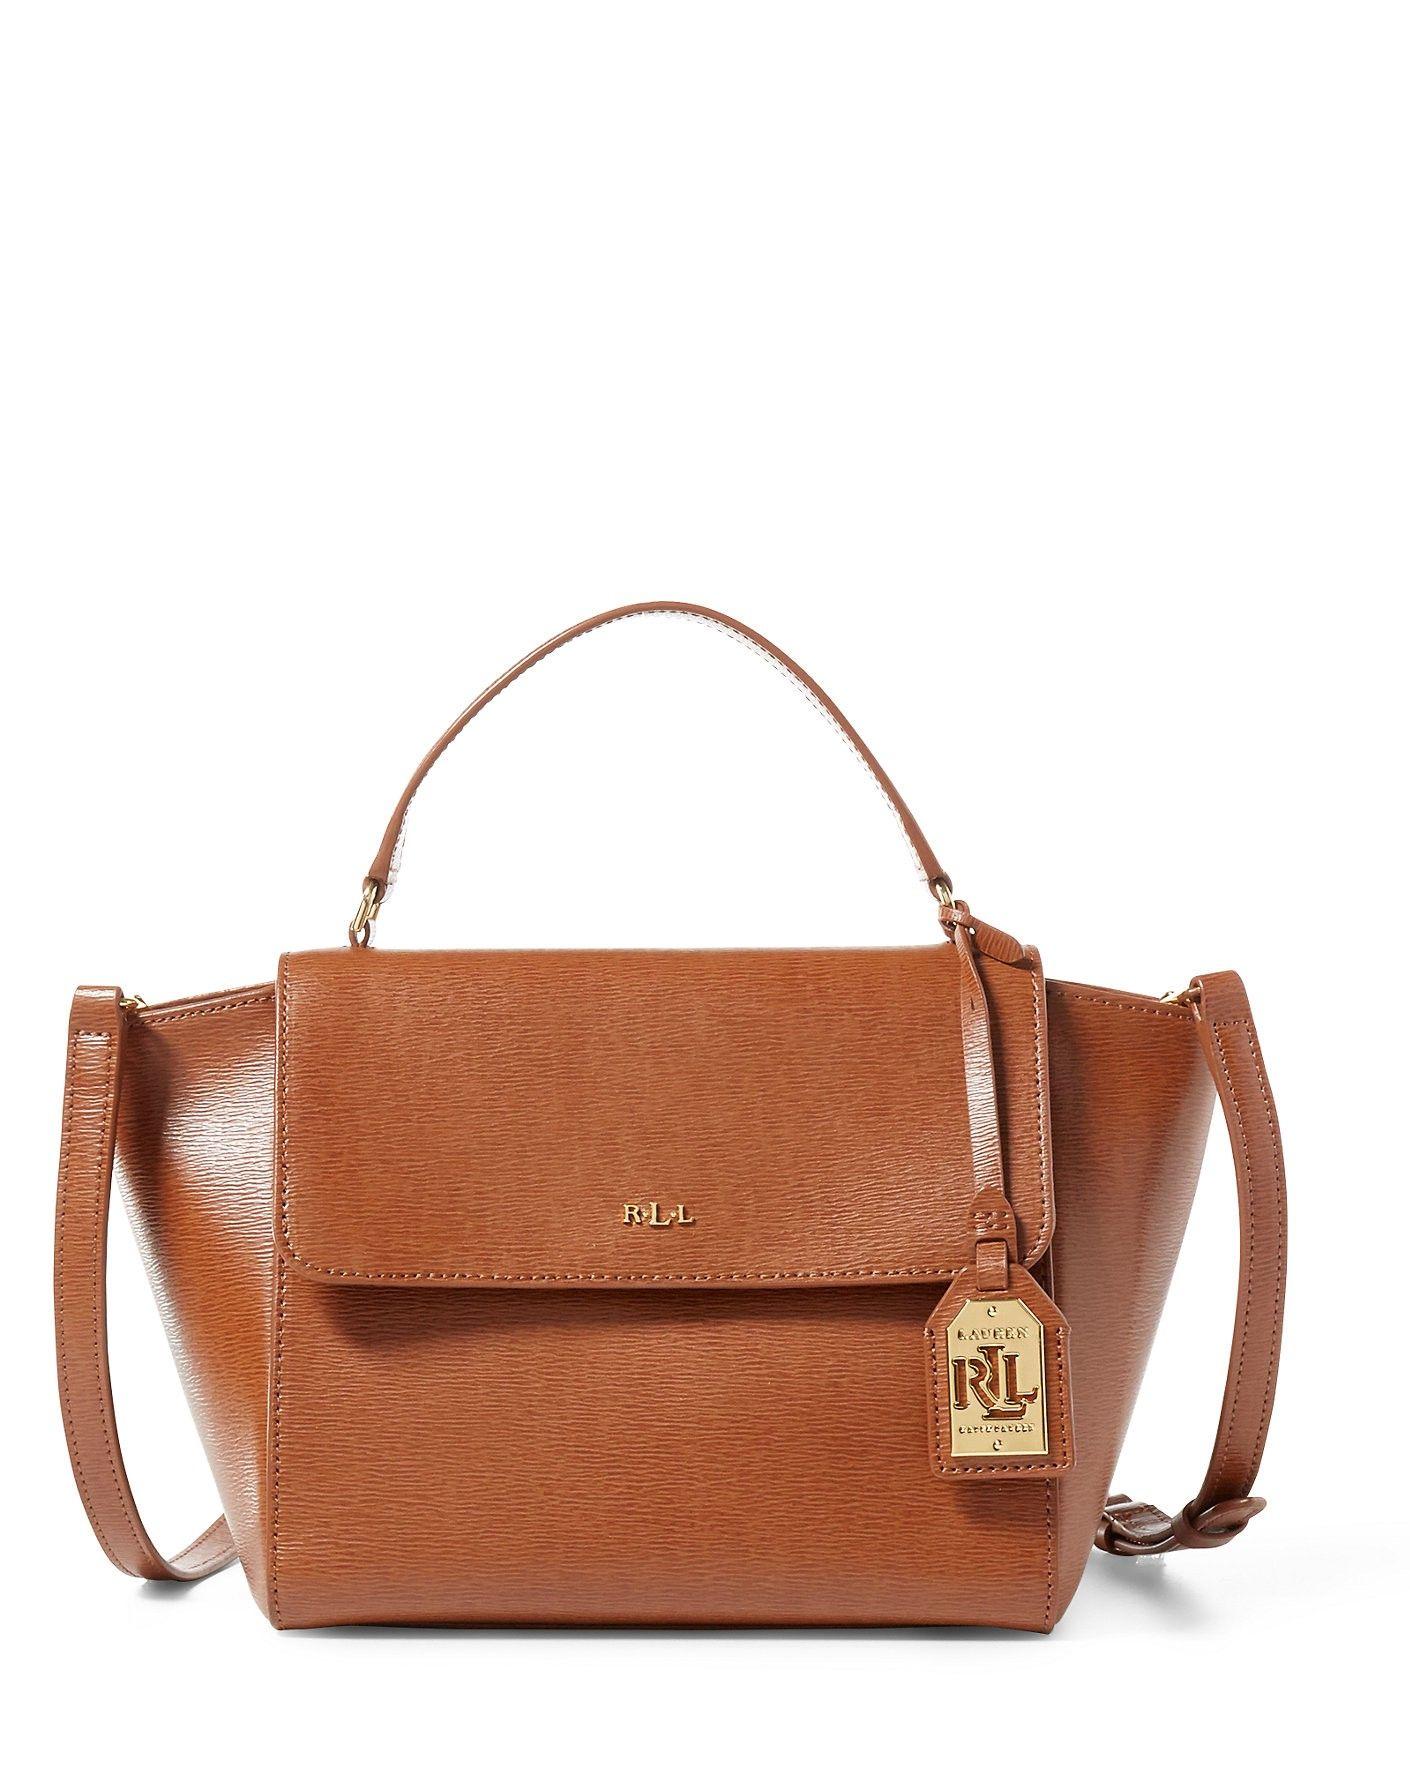 691b65040 RALPH LAUREN Leather Barclay Crossbody Bag. #ralphlauren #bags #shoulder  bags #hand bags #polyester #leather #crossbody #